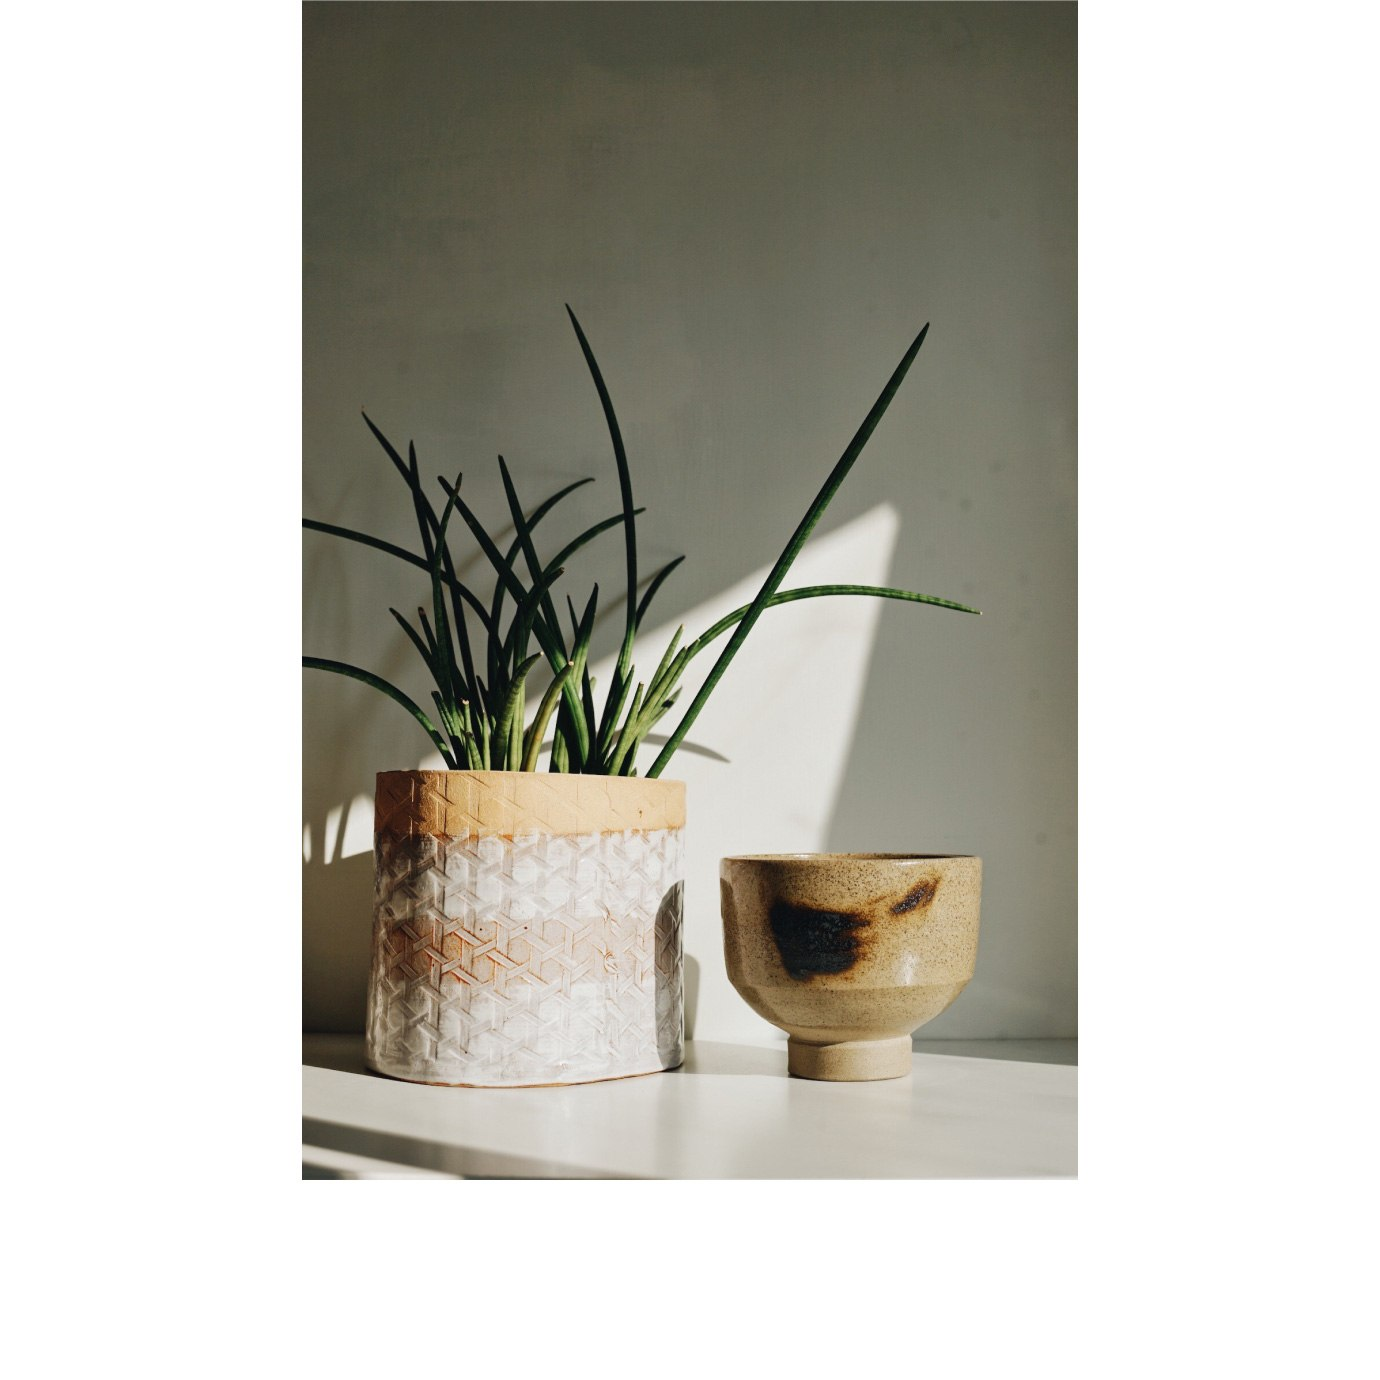 A ceramic bowl next to a plant in a ceramic vase.